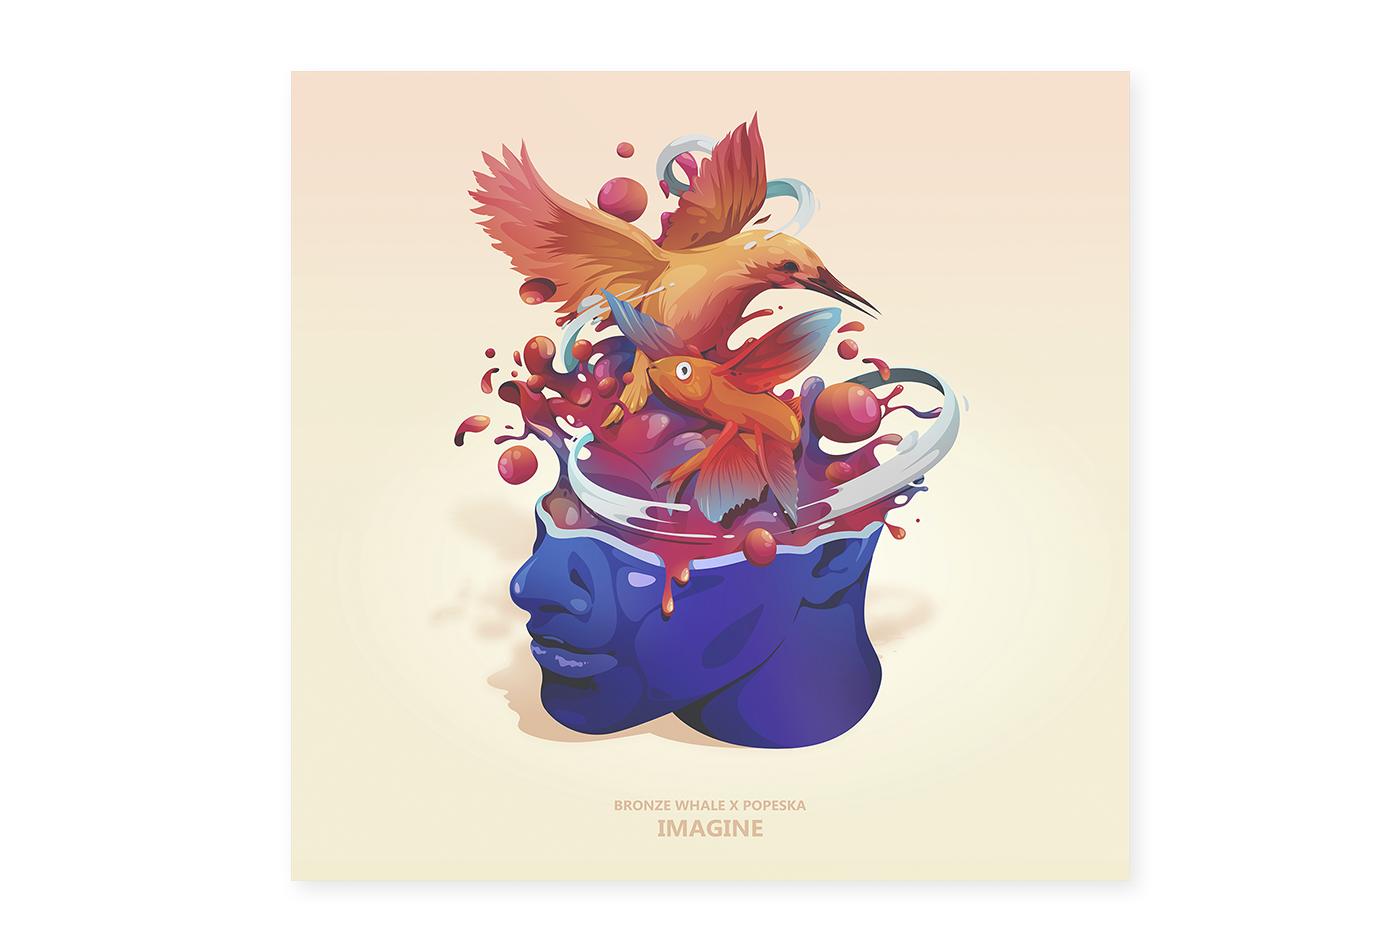 music Album soundtrack ILLUSTRATION  design direction Imagine wacom